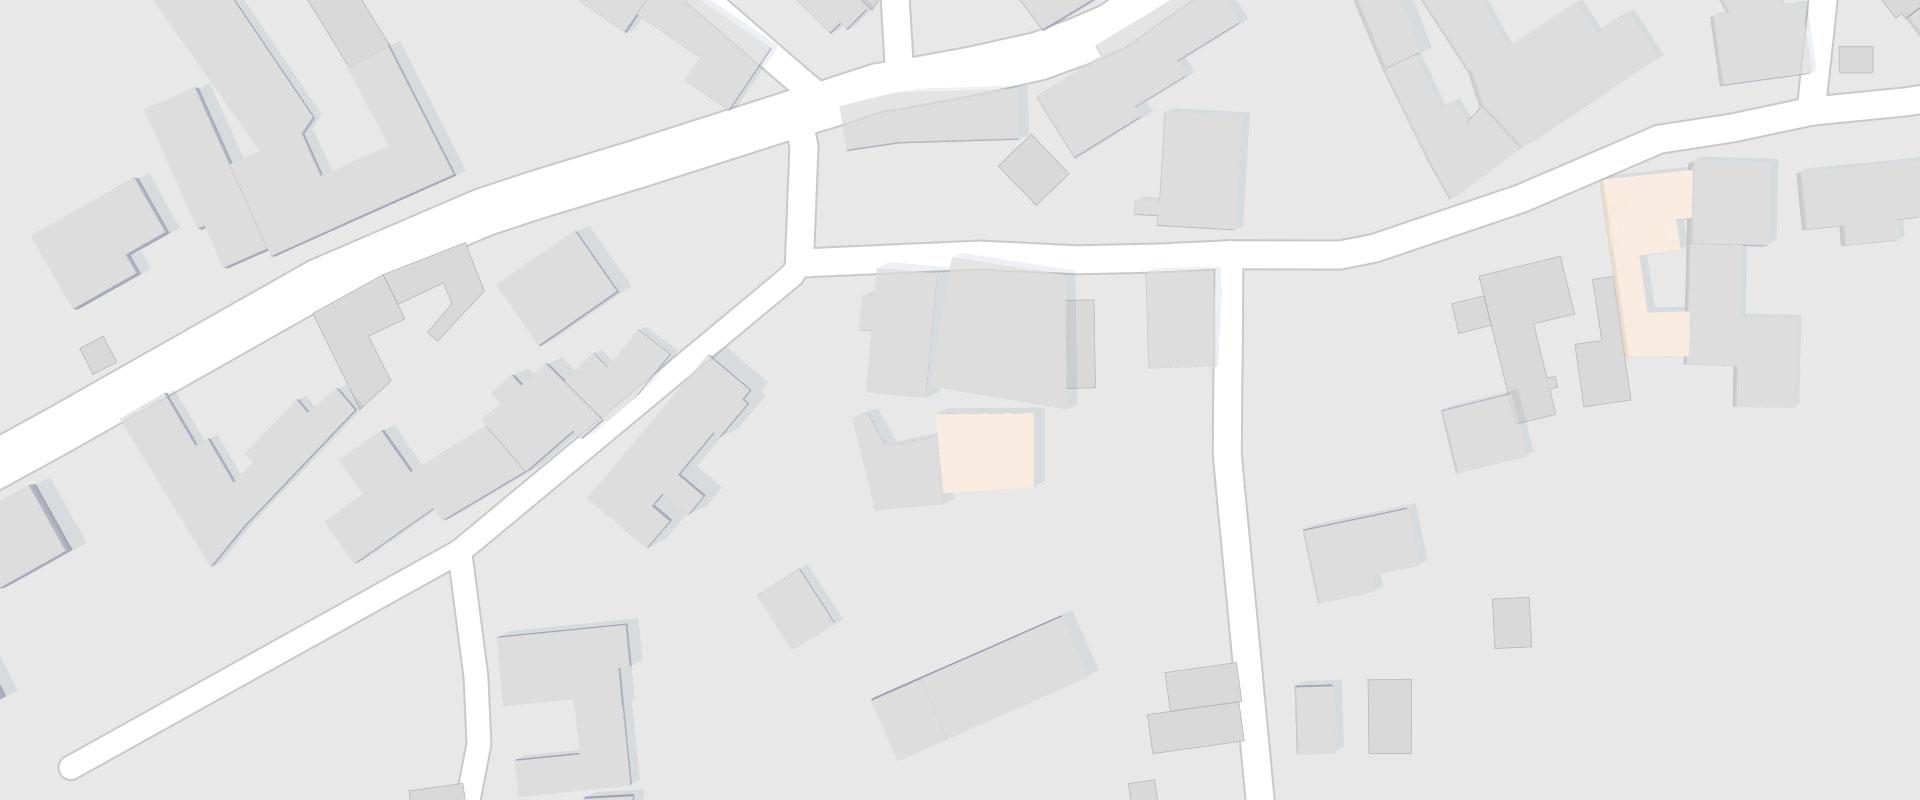 Weingut-Map-01